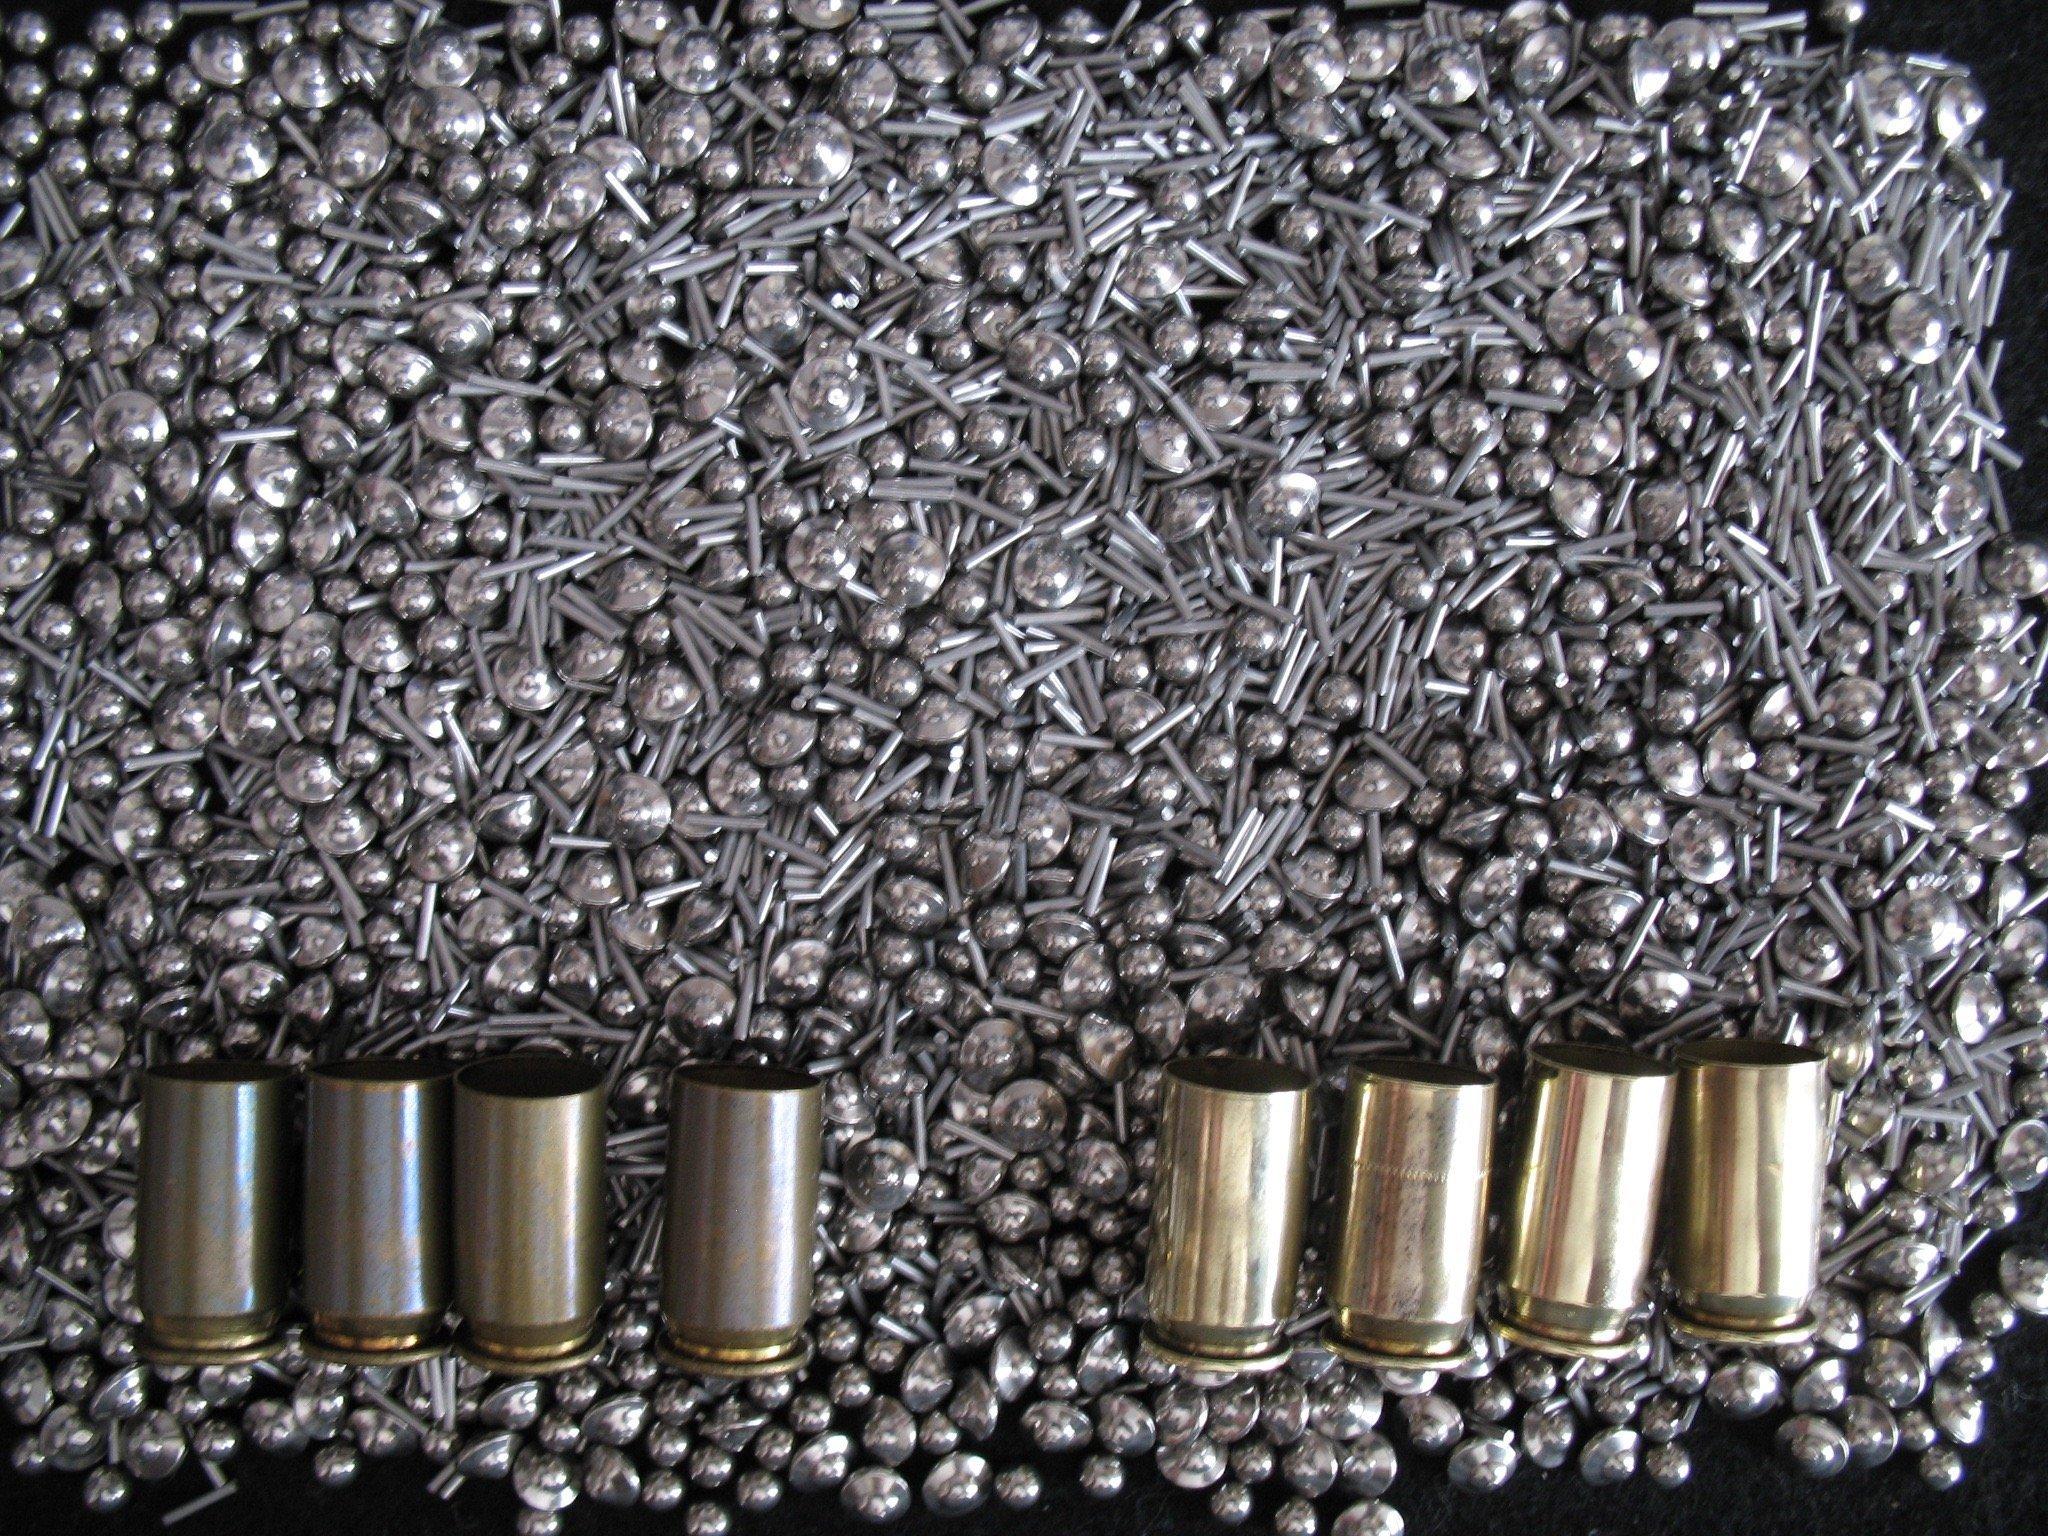 Tumbling Media 2 lb bag Jeweler's Mix Type 3 (3 shapes & Sizes) by Ball Baron